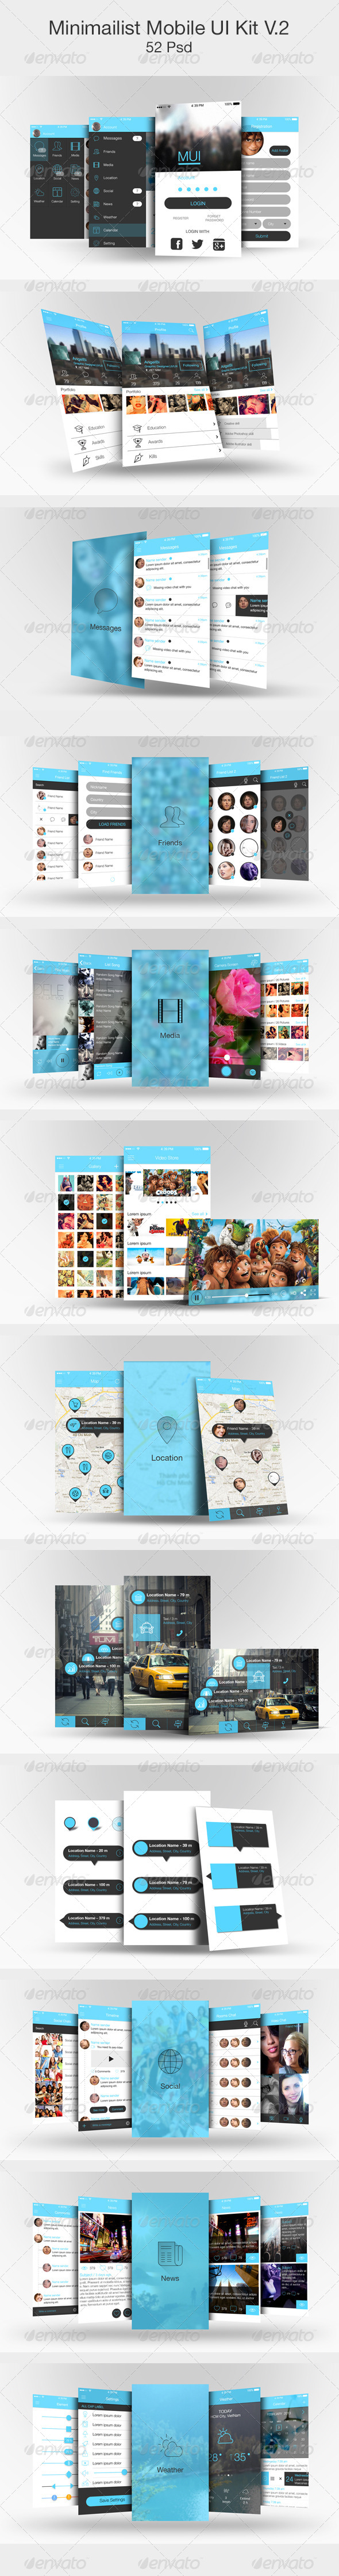 GraphicRiver Minimailist Mobile UI Kit V.2 5819008